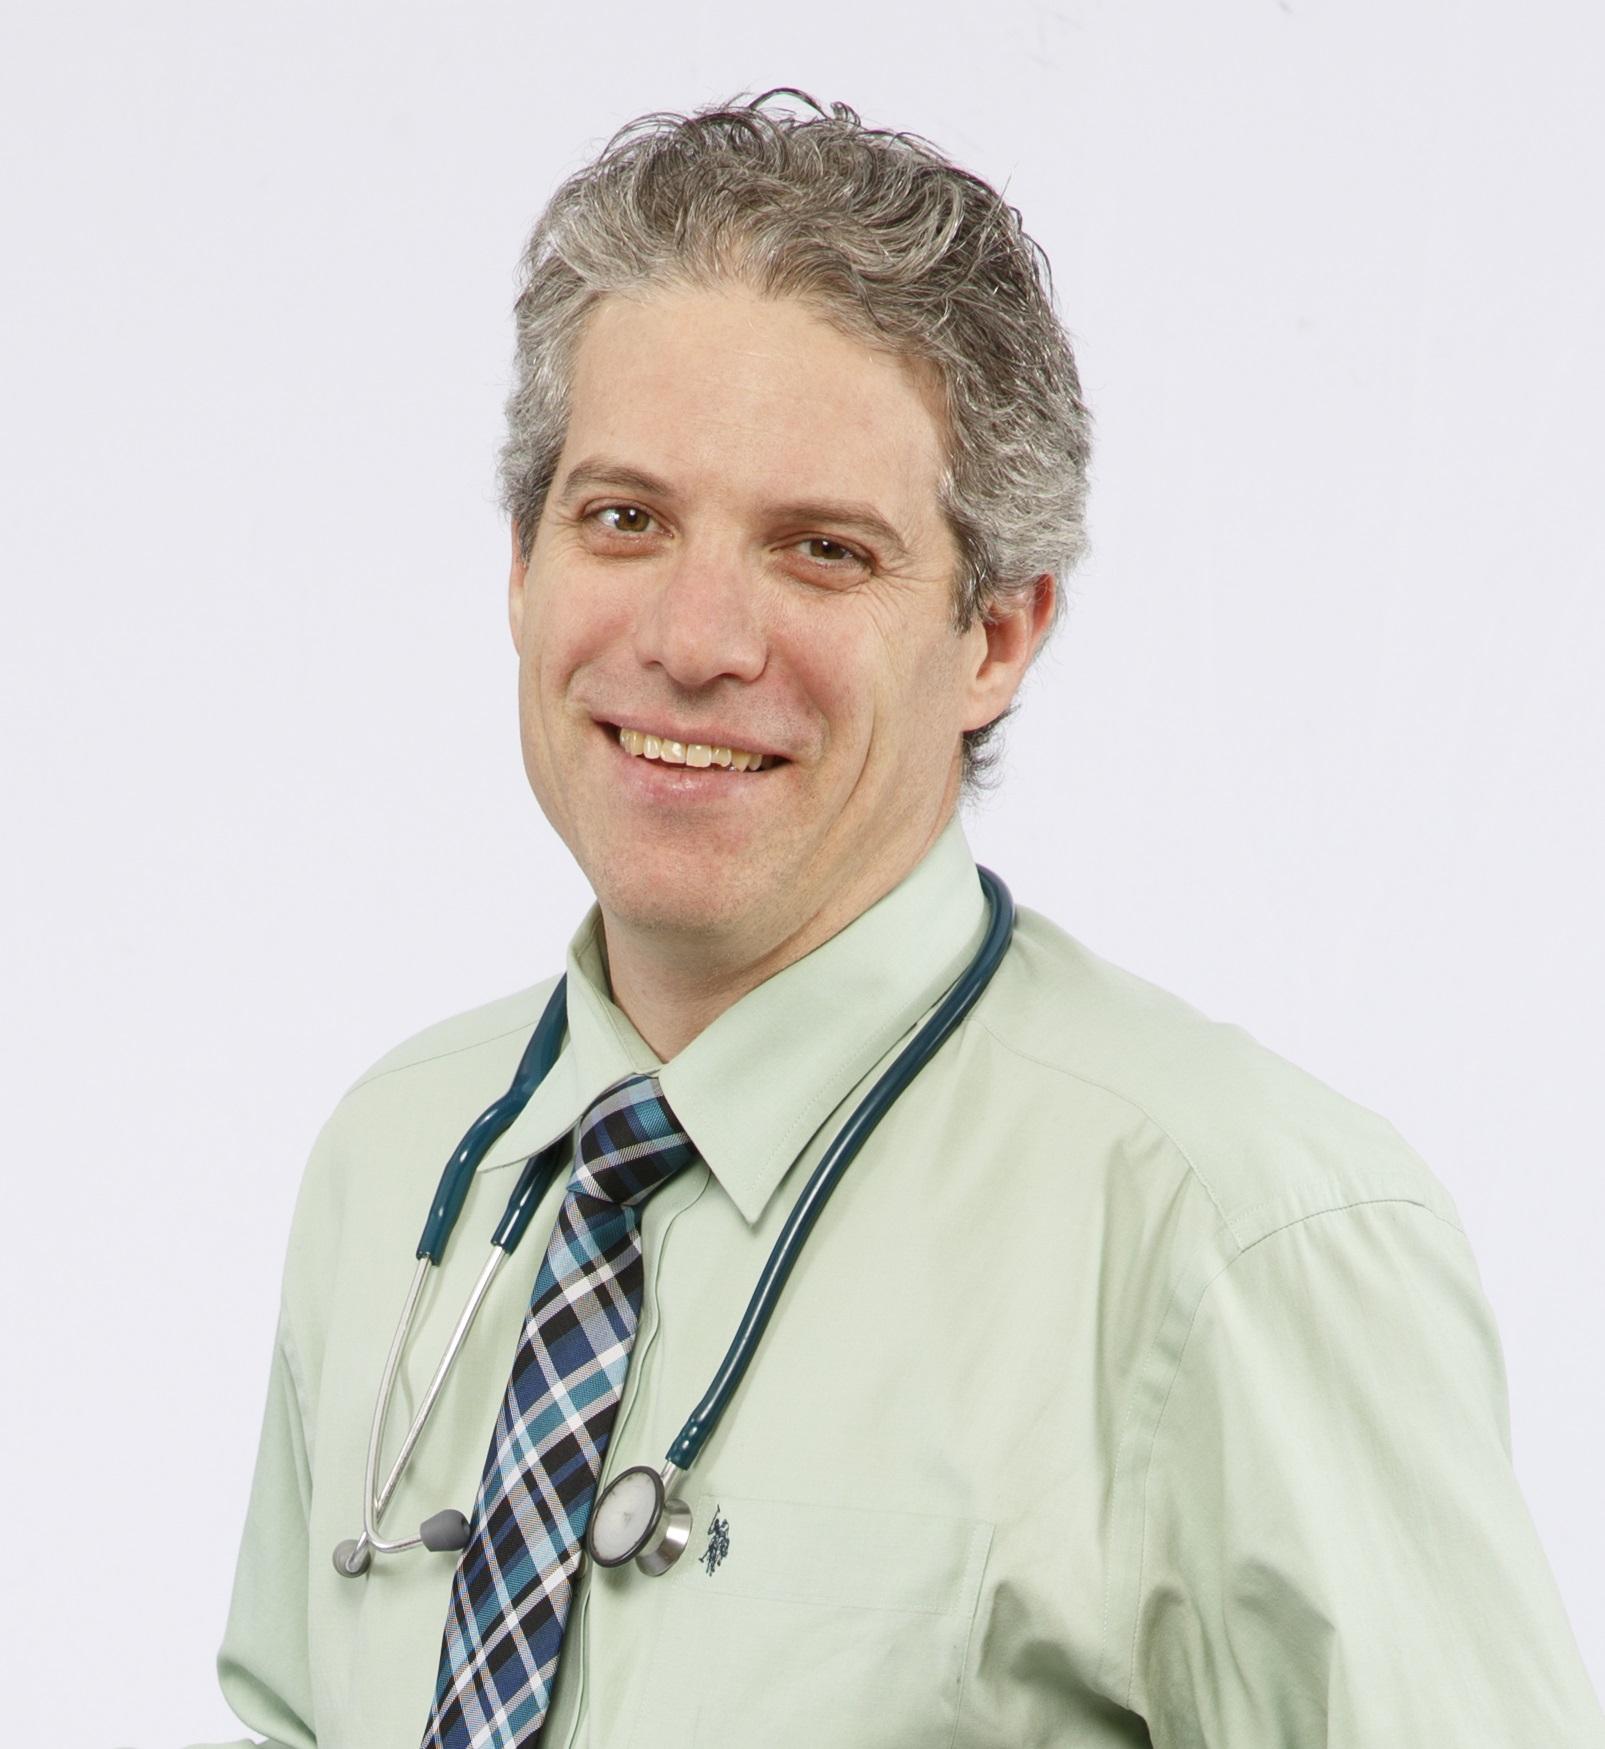 PROFESSOR JONATHON MAGUIRE